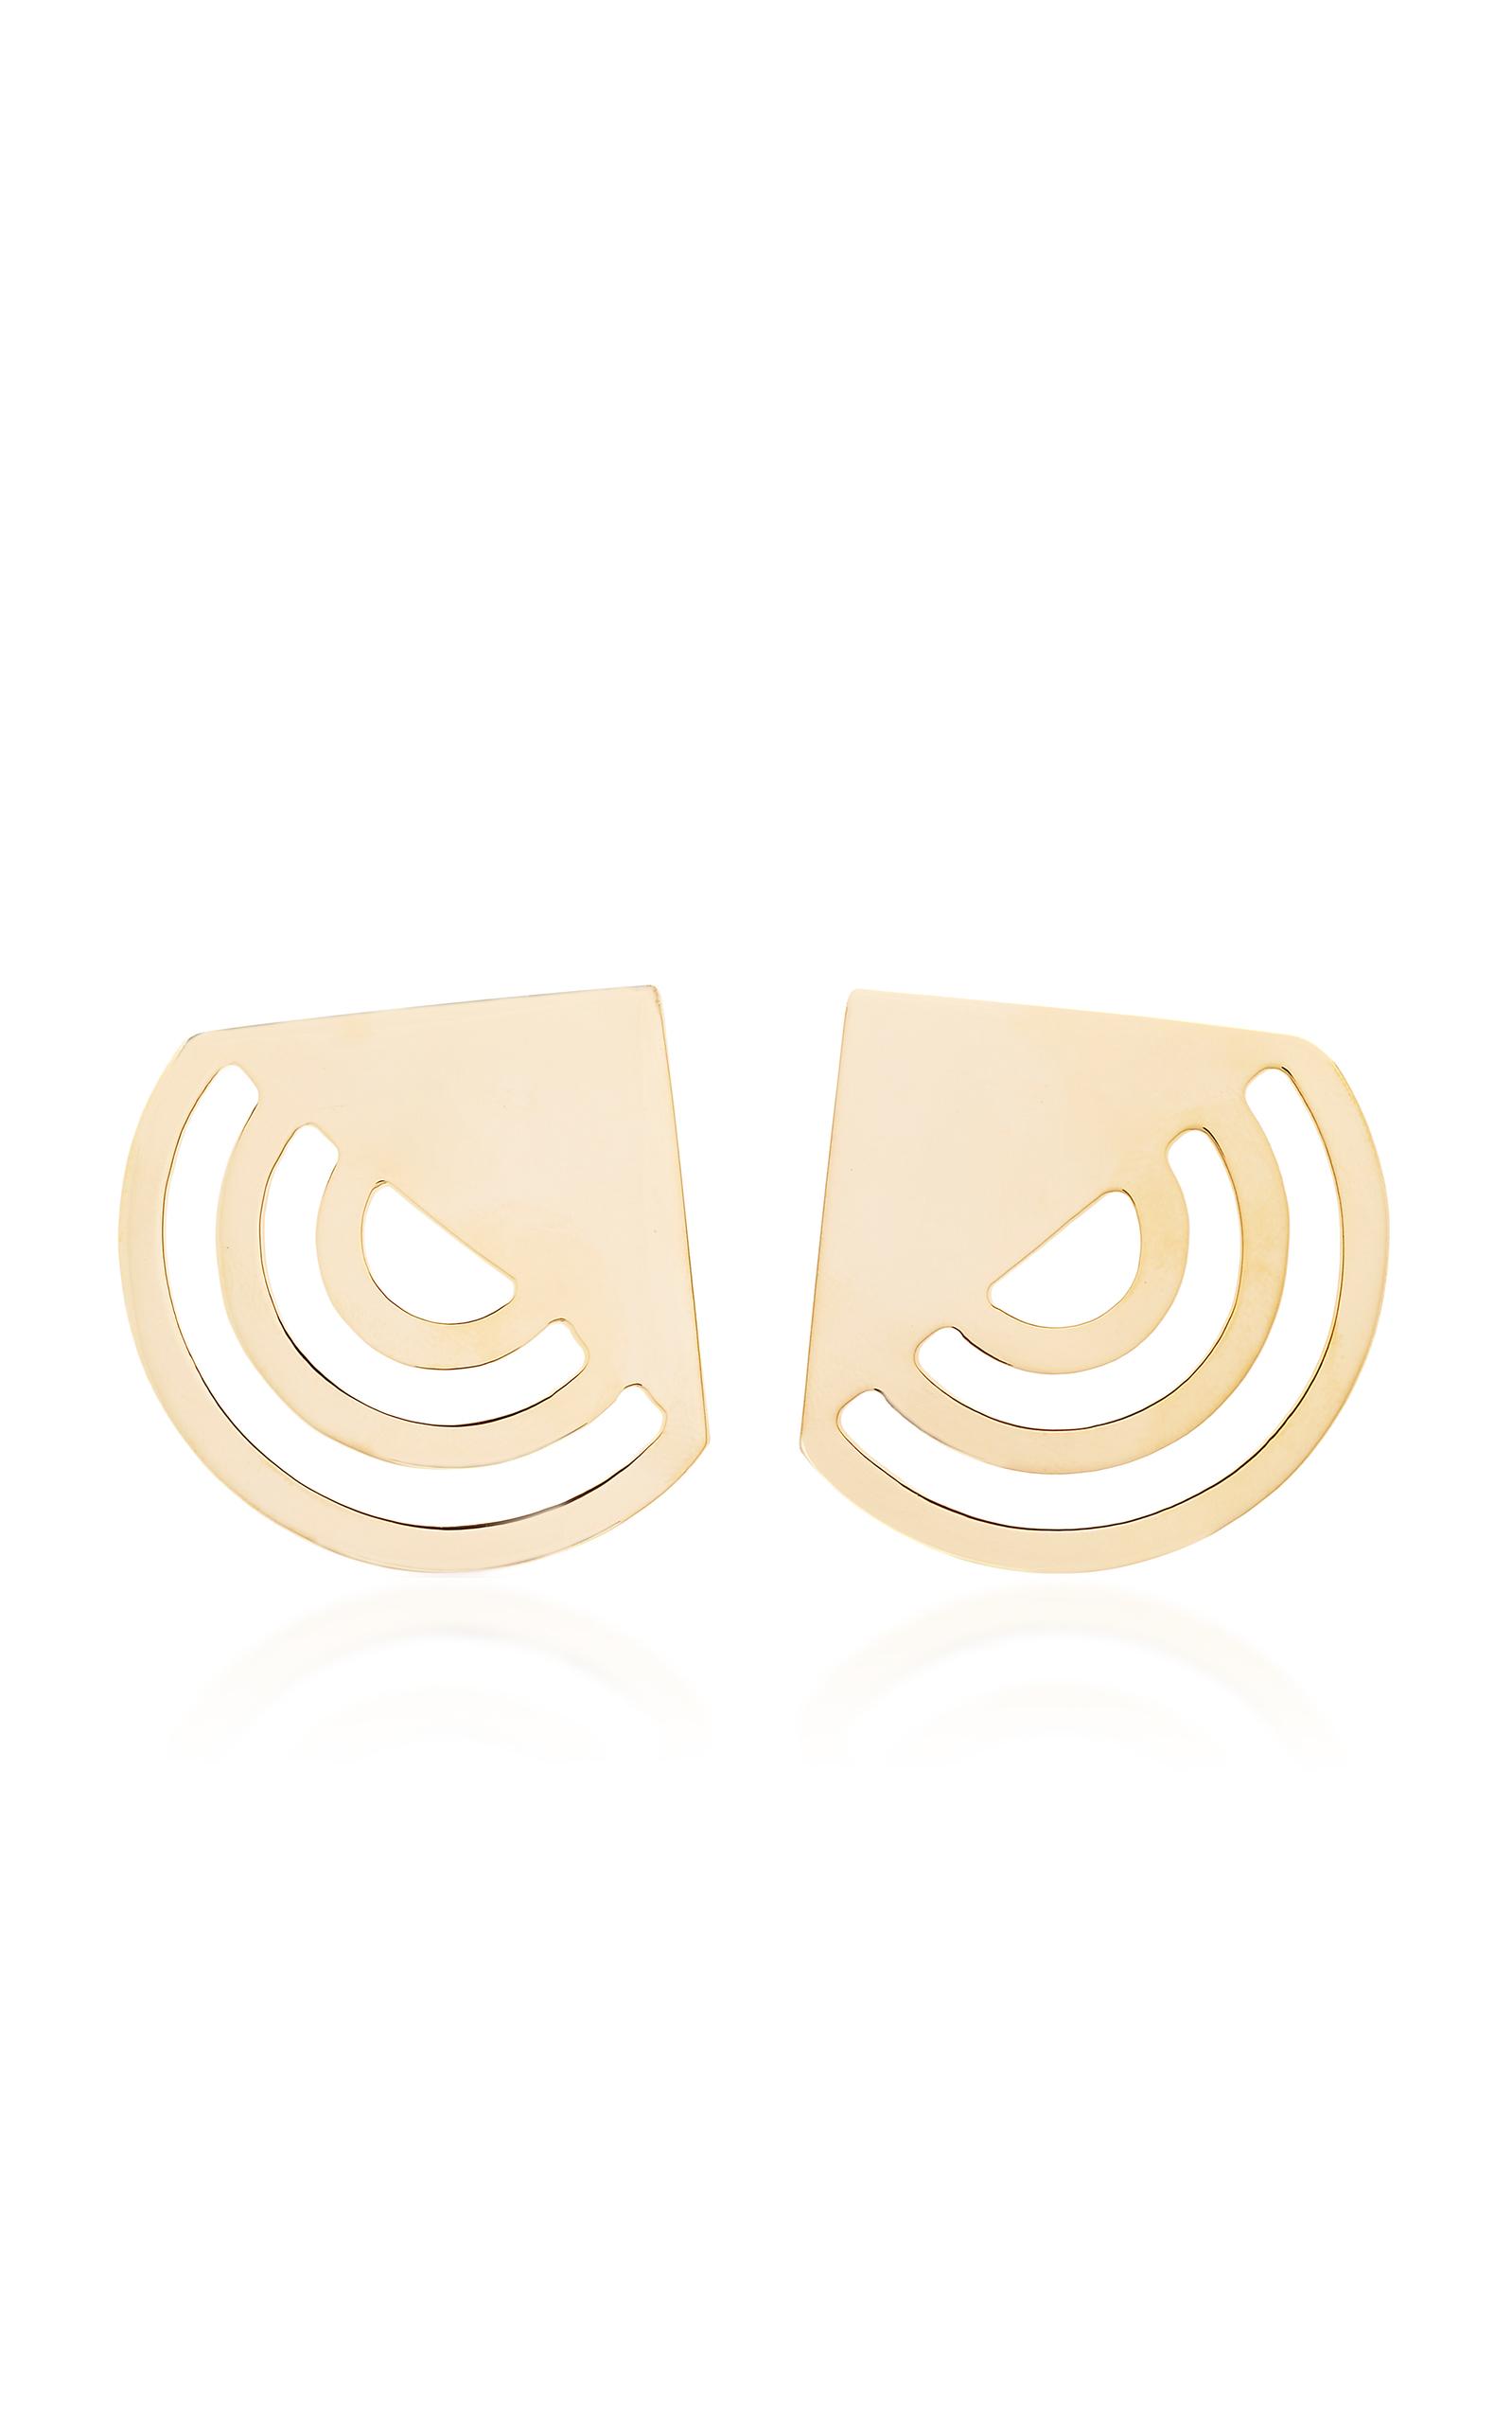 BIA DAIDONE GATSBY 24K GOLD-PLATED EARRINGS